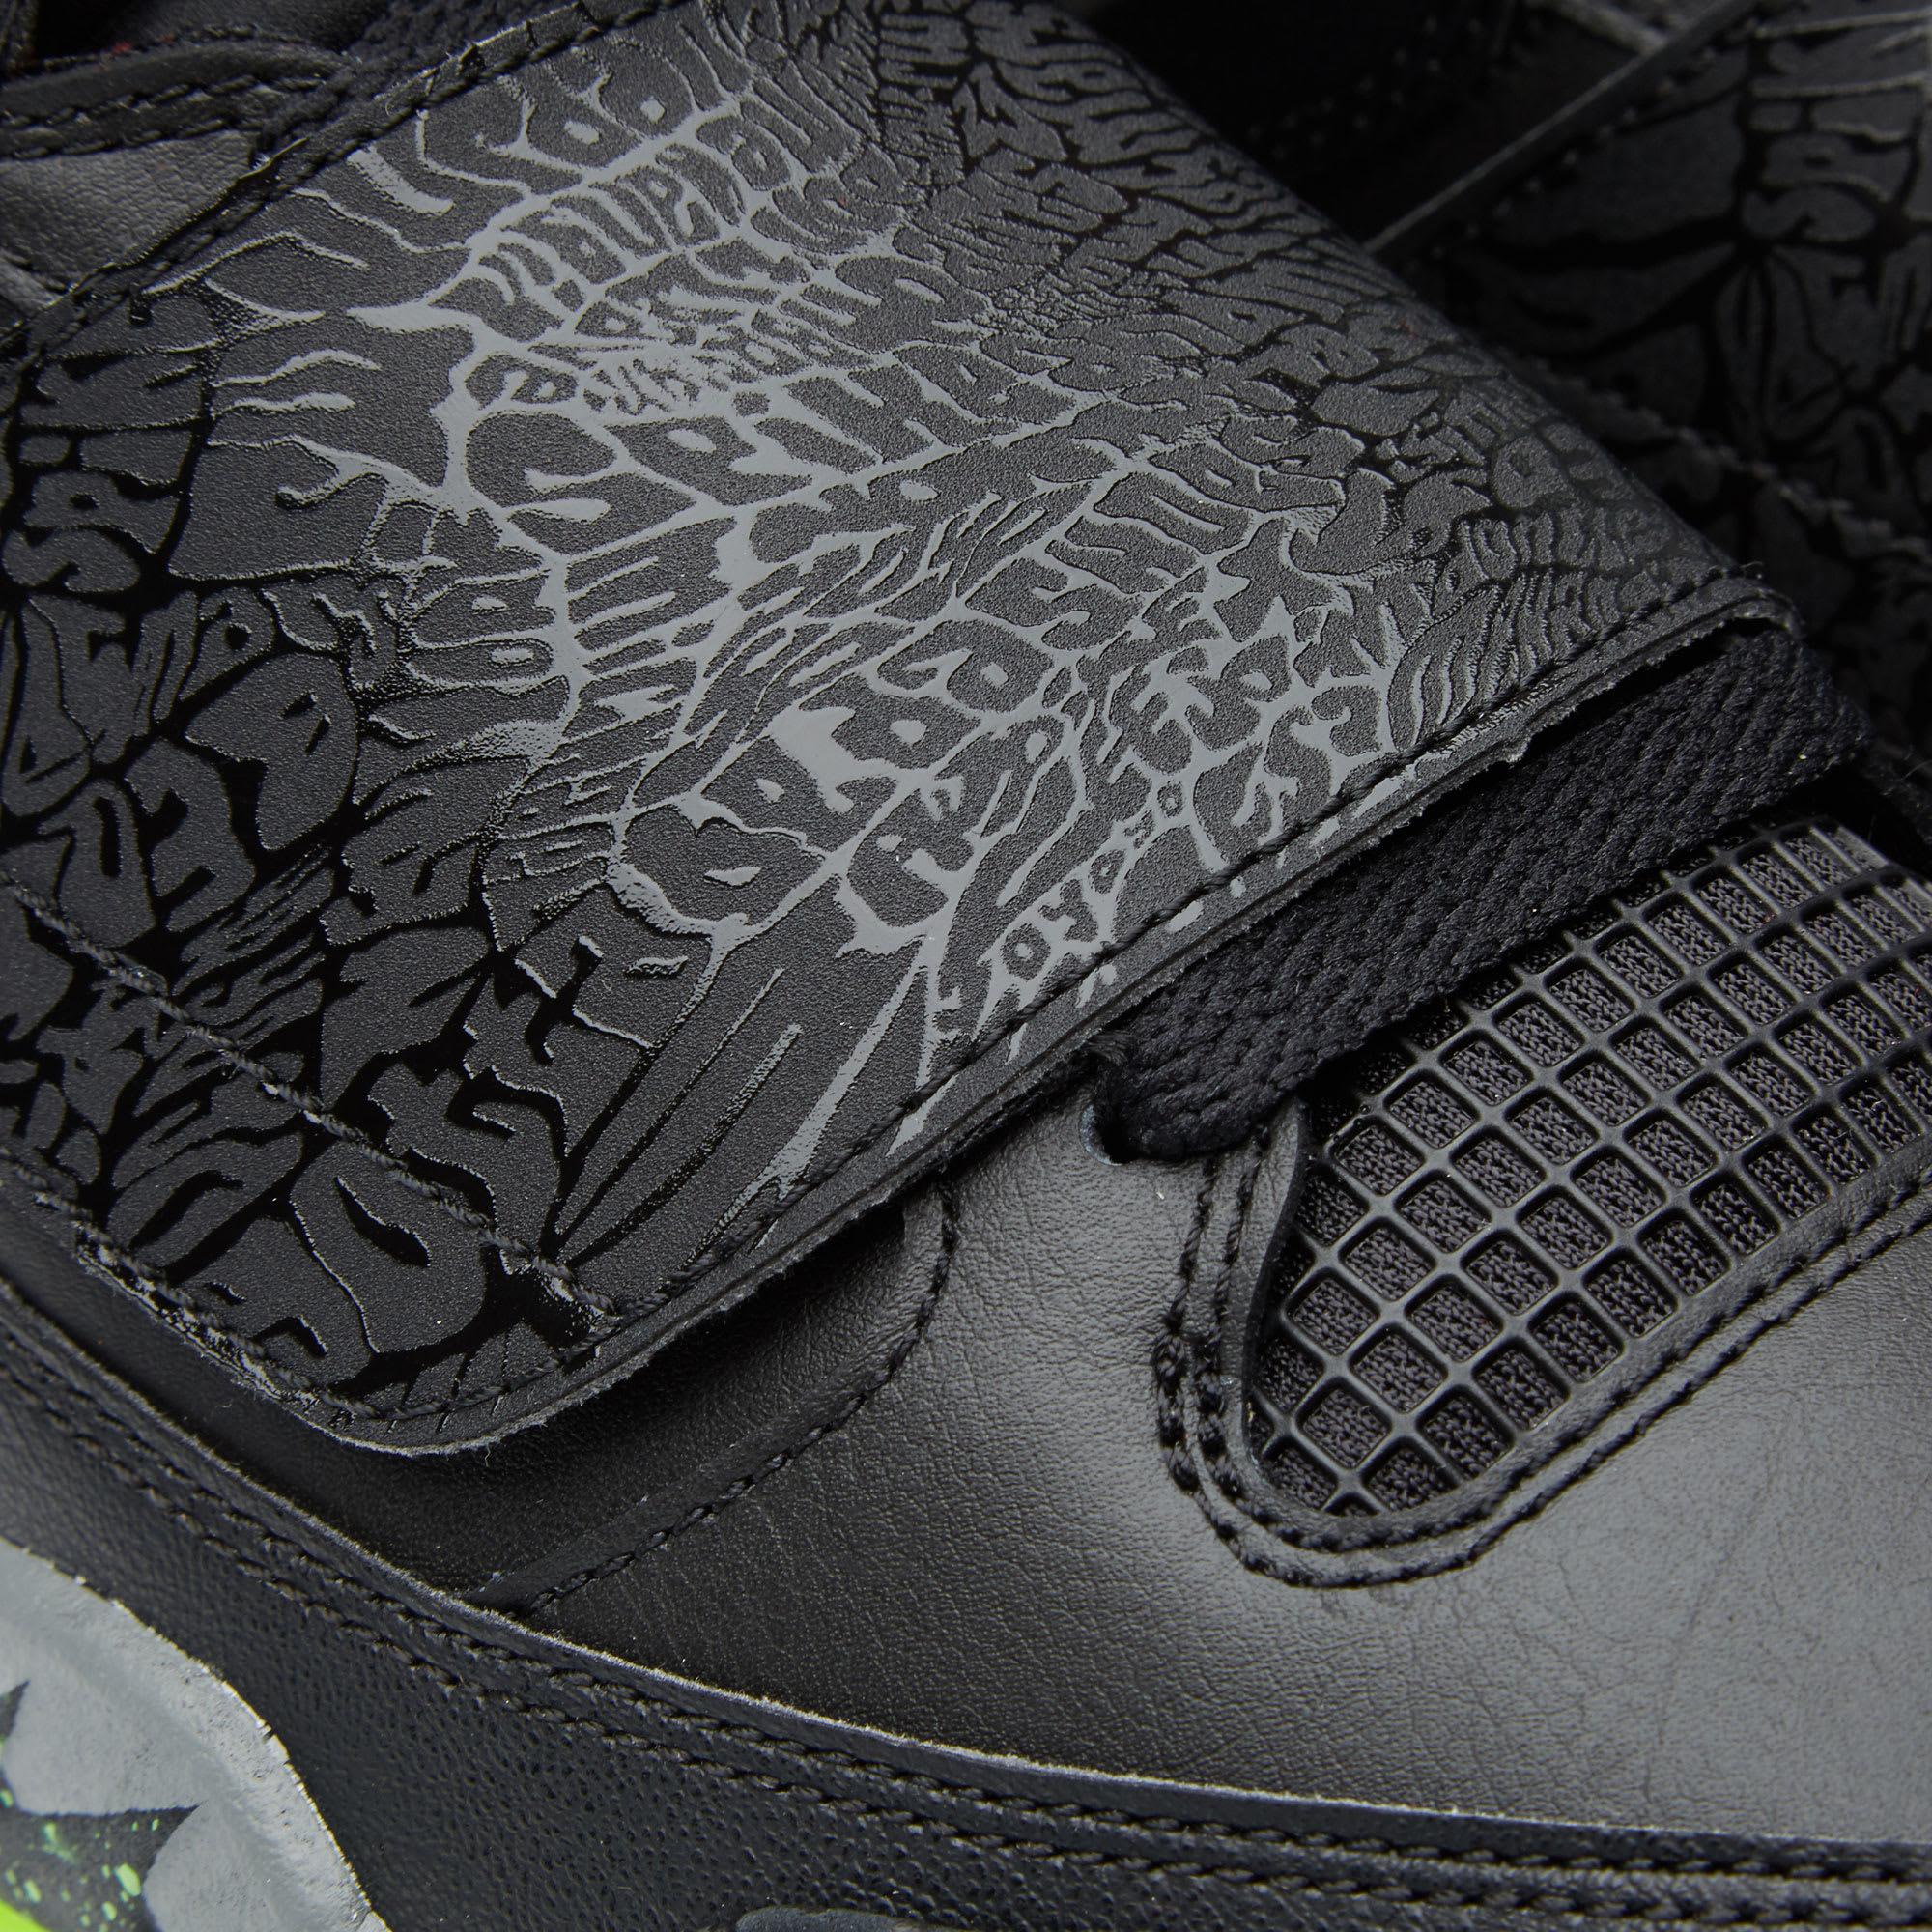 big sale 275d8 bf760 Nike Air Jordan Son of Mars Black, Gym Red   Cool Grey   END.